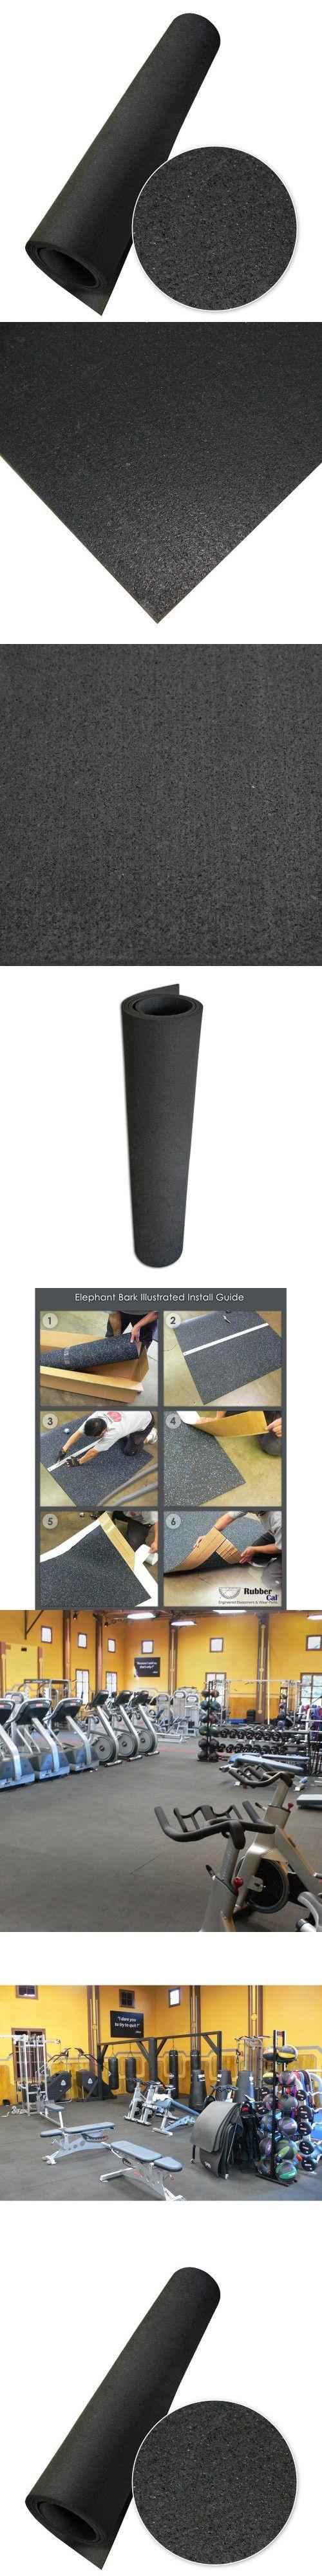 Mini cooper rubber floor mats uk - Rubber Cal Elephant Bark Rubber Flooring Inch X X Rubber Mat Black